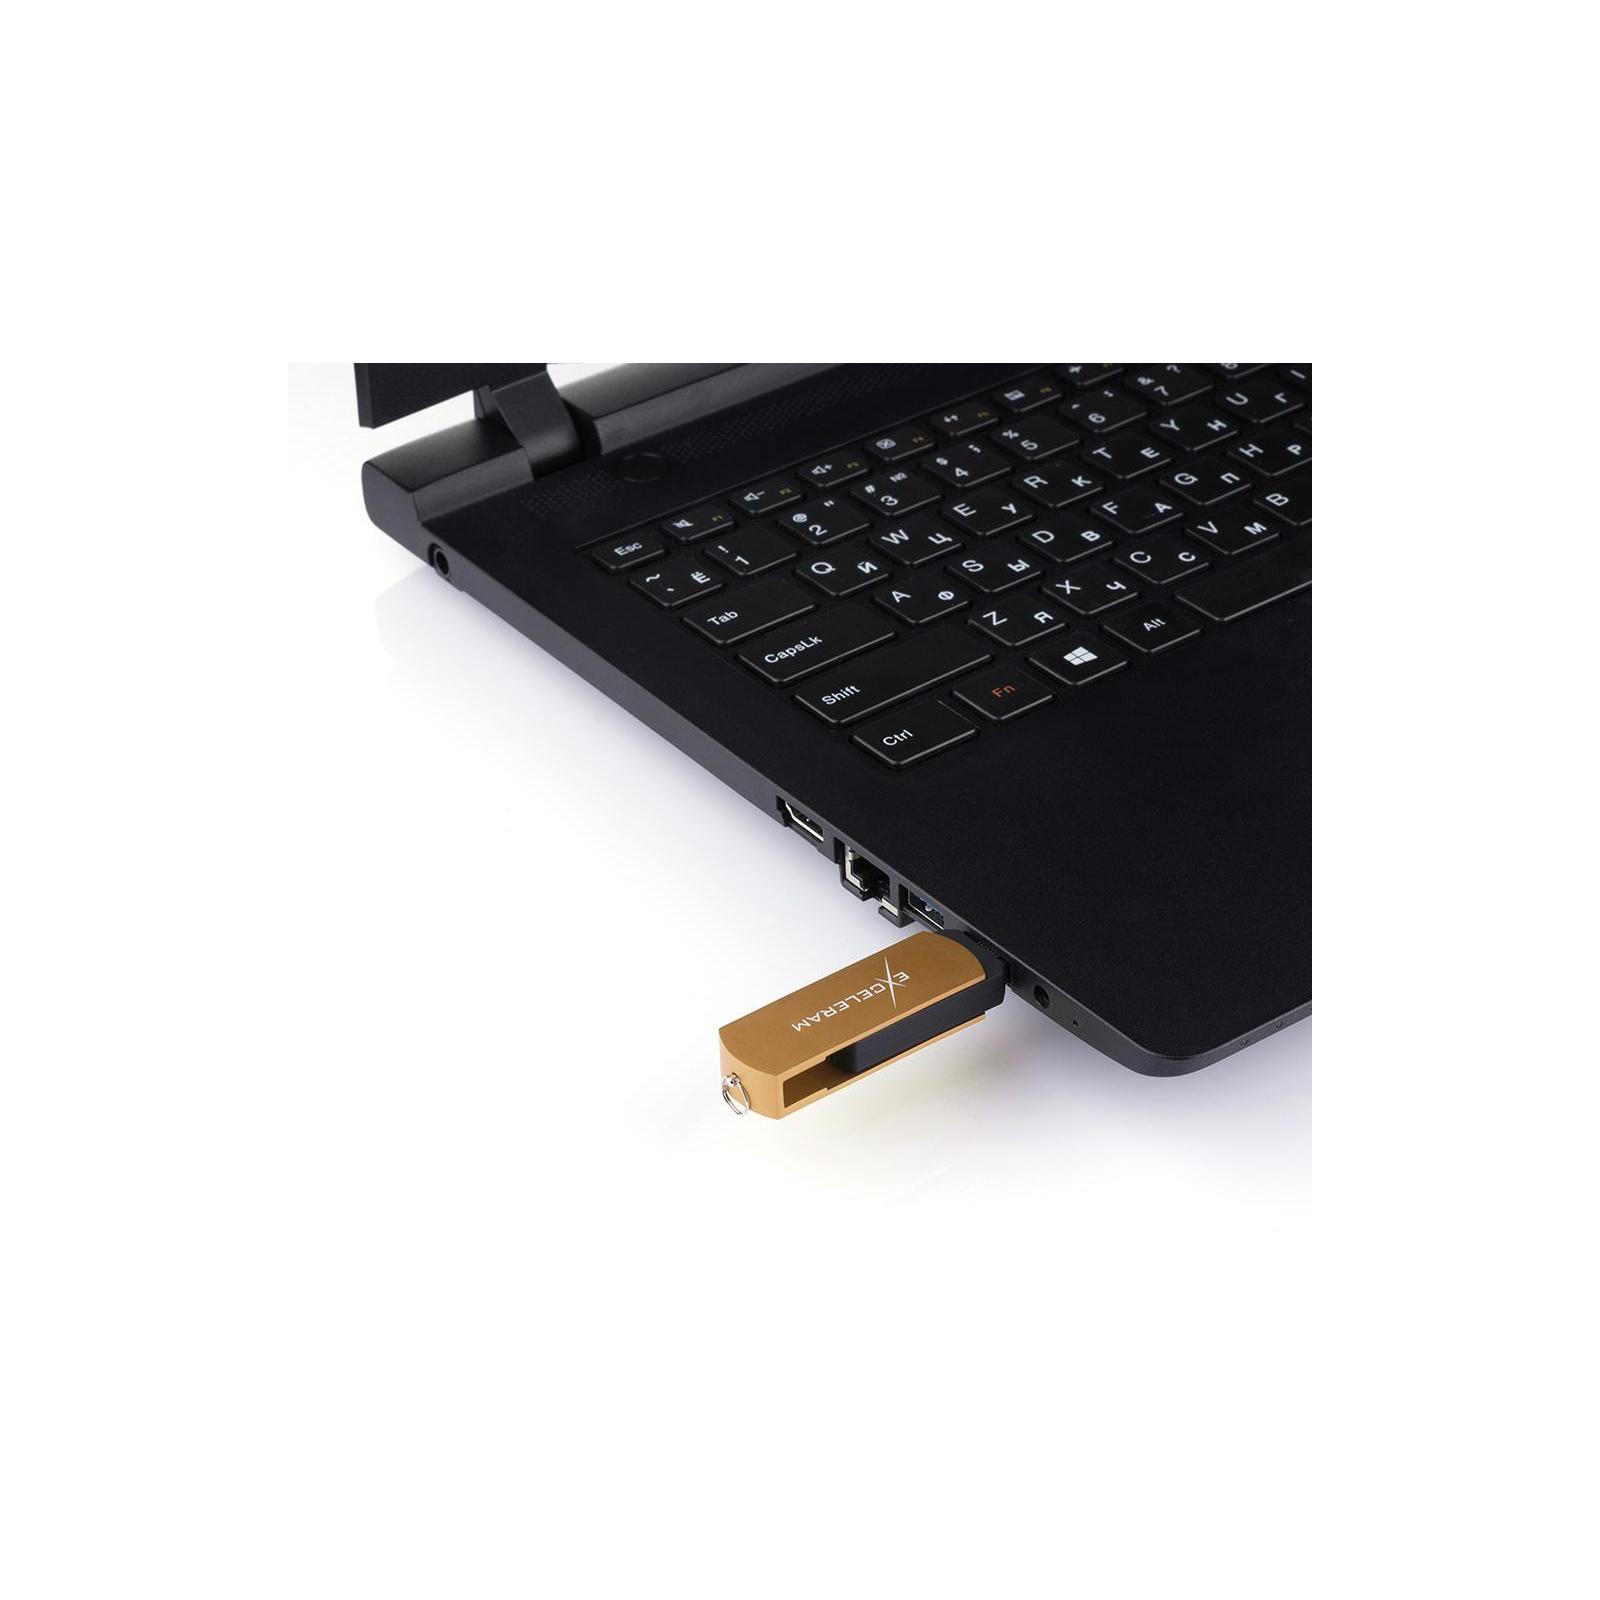 USB флеш накопитель eXceleram 128GB P2 Series Red/Black USB 3.1 Gen 1 (EXP2U3REB128) изображение 7